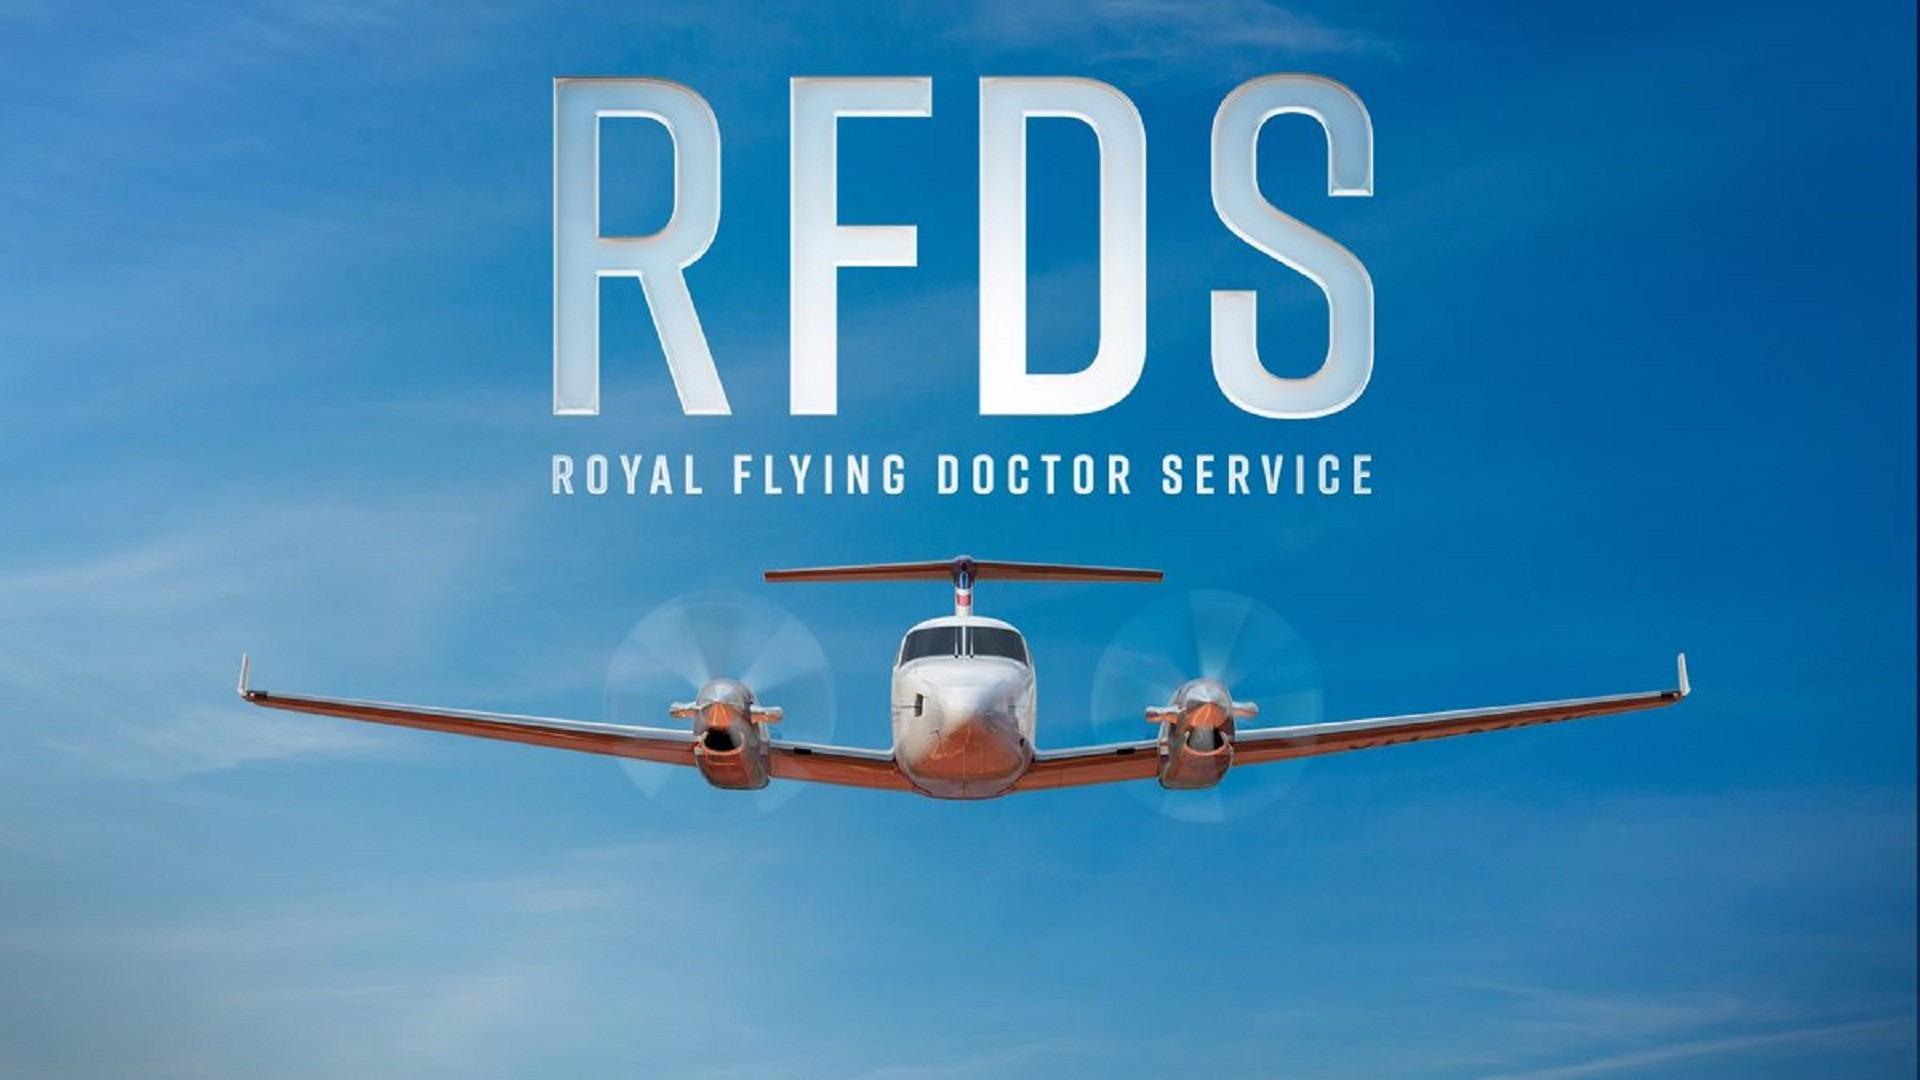 Show RFDS